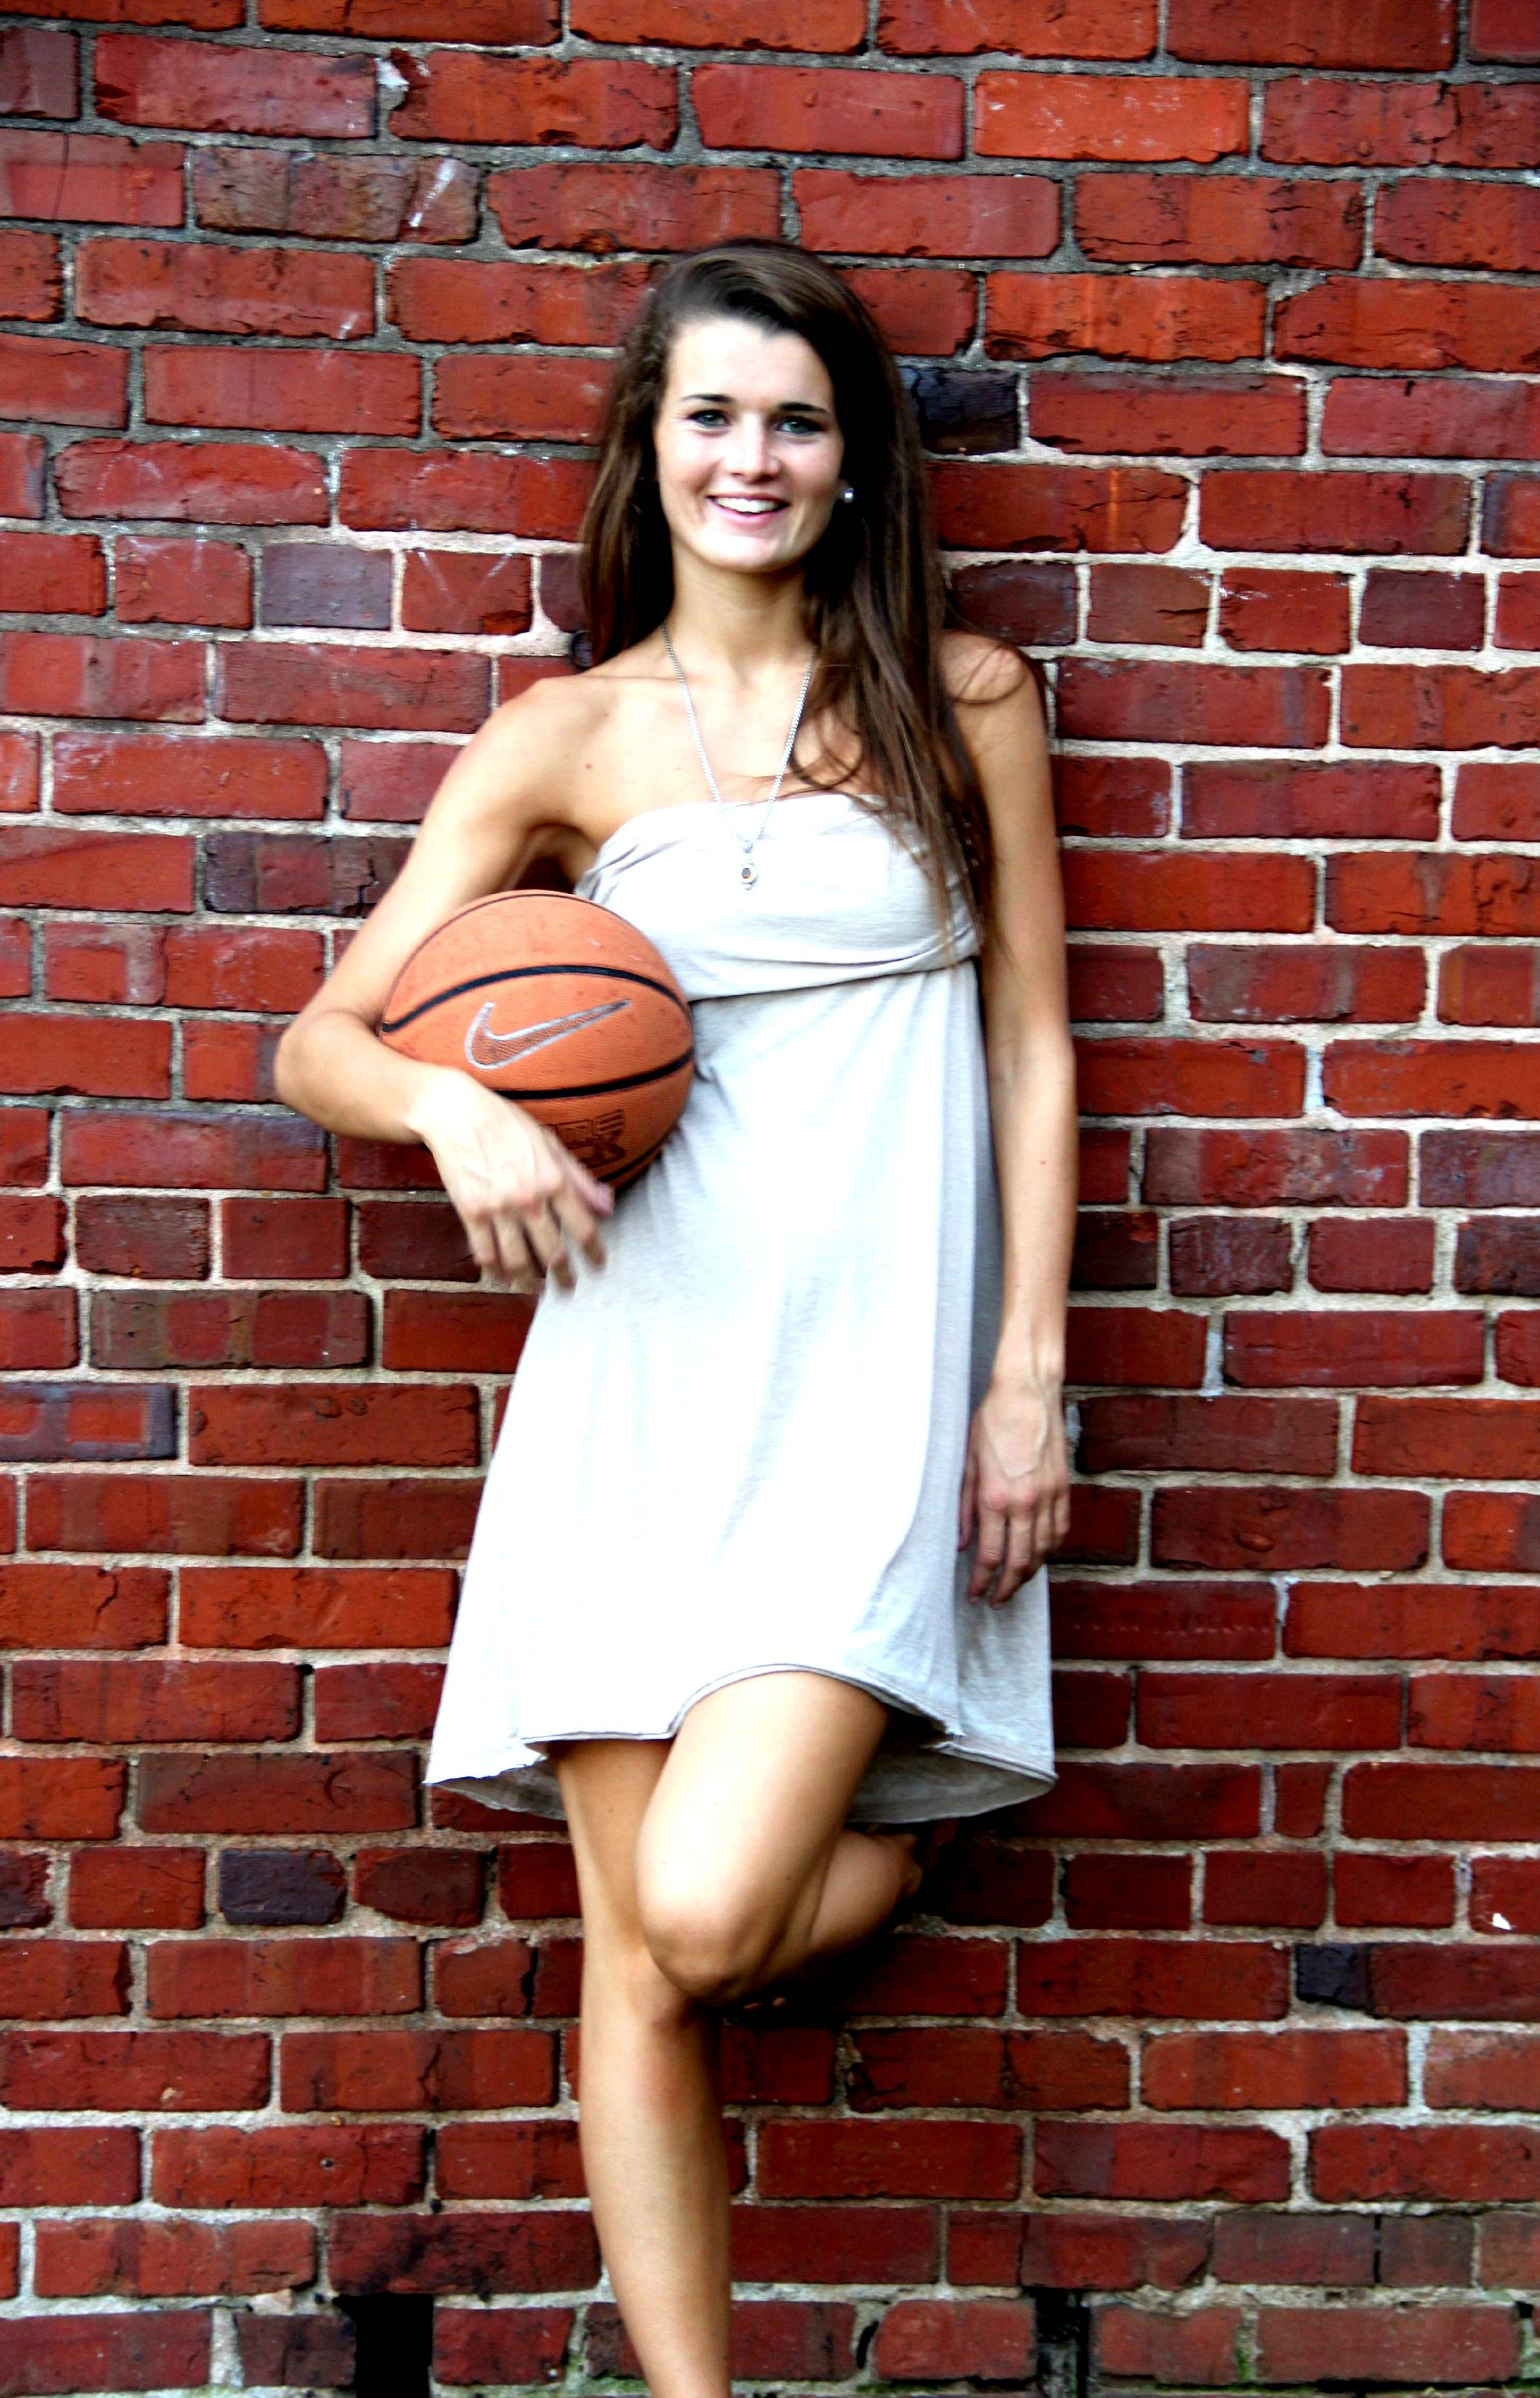 Senior Portrait fun - vintage brick with basketball